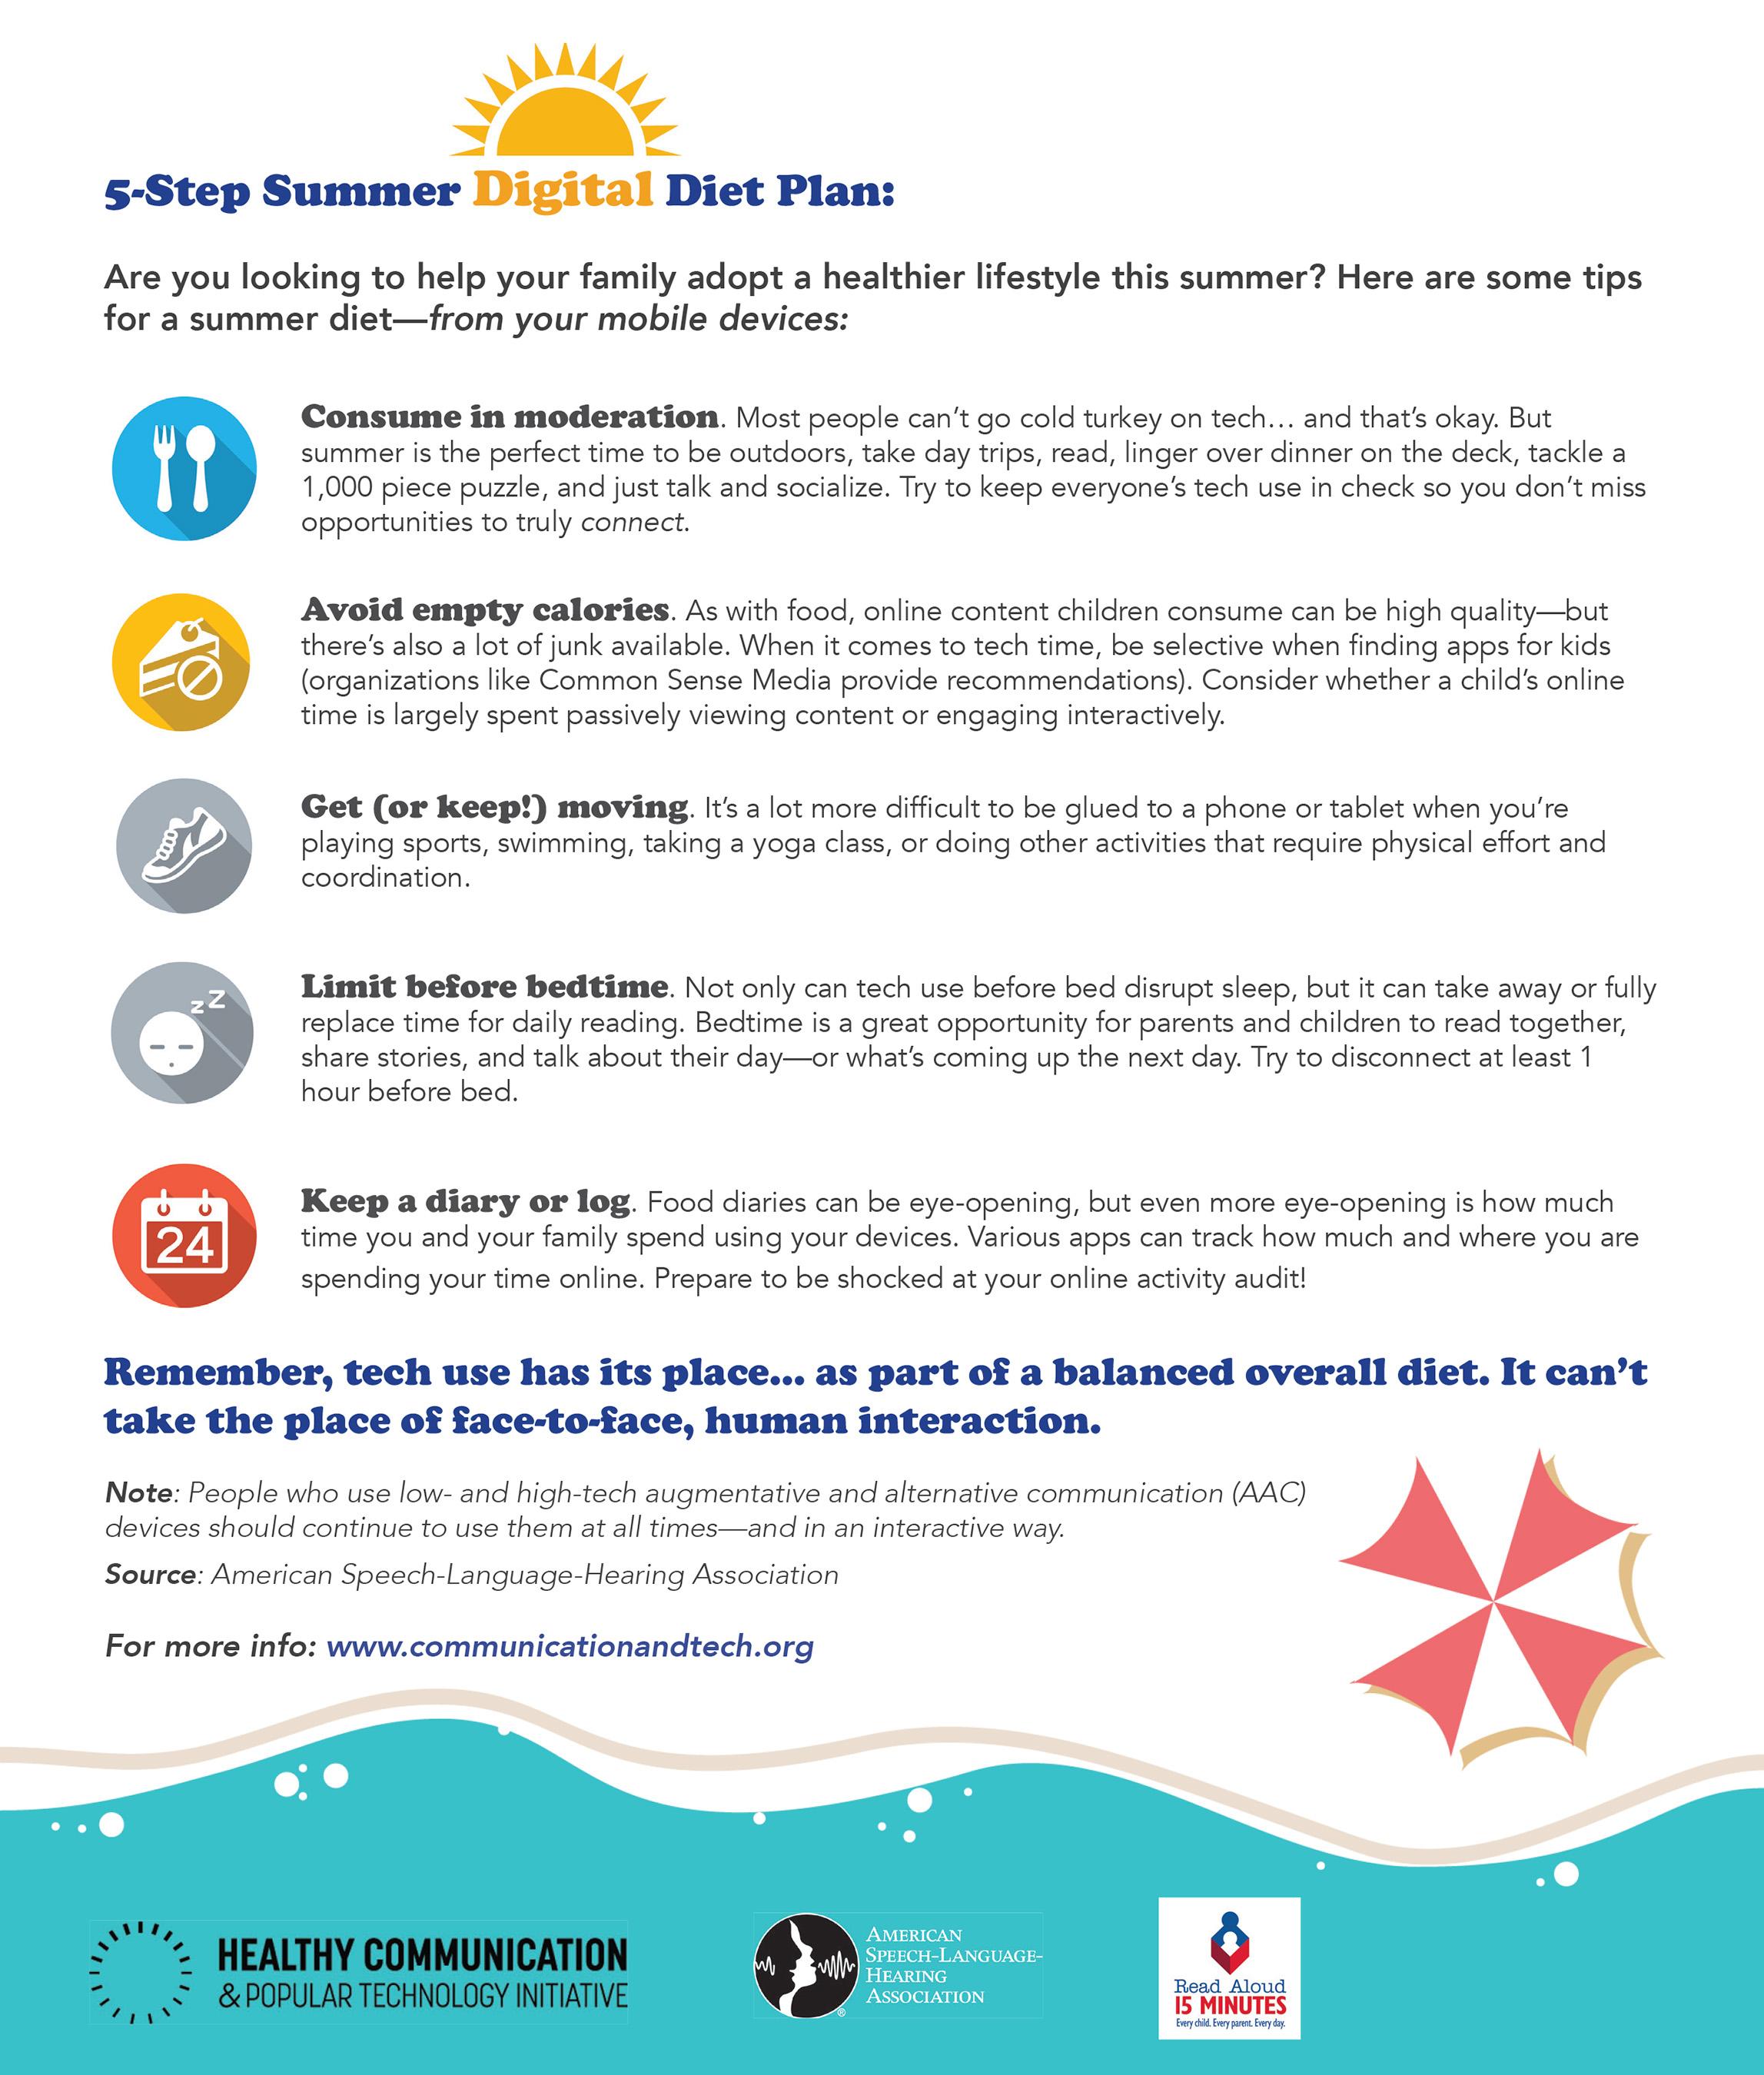 5-Step Summer Digital Diet